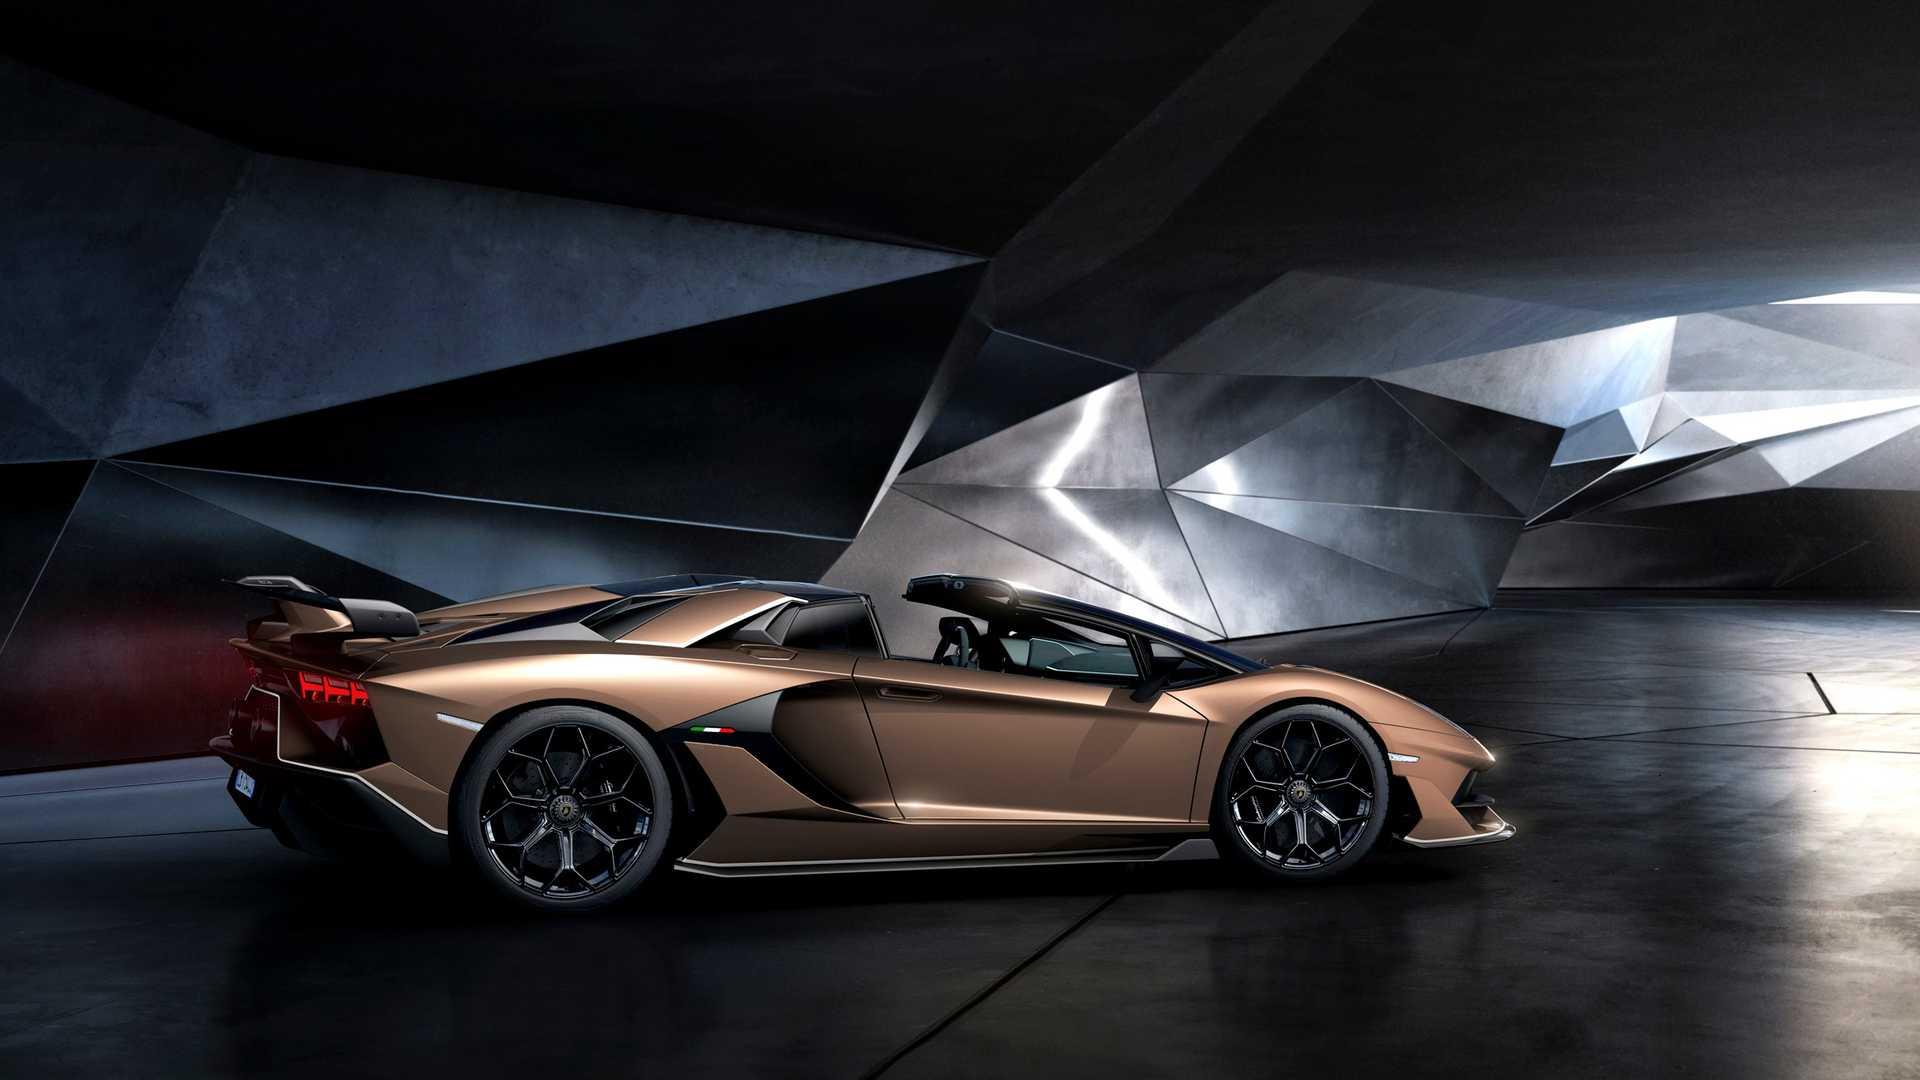 2020 Lamborghini Aventador SVJ Roadster Side Wallpaper (15)